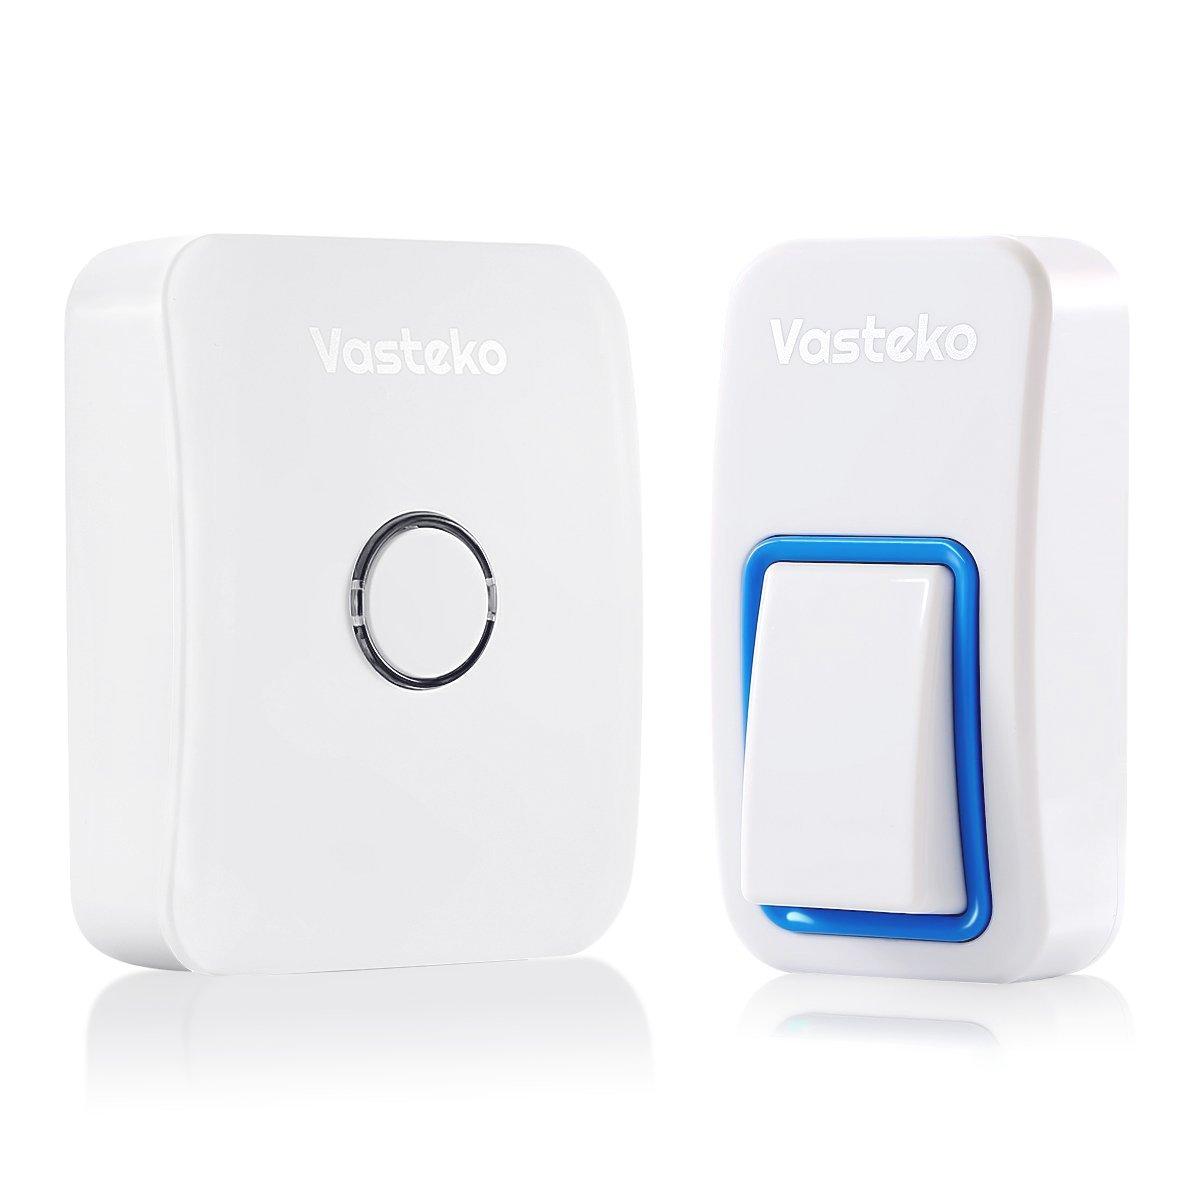 Vasteko Wireless Doorbell Kits No Battery Required Both Transmitter Receiver, IPX7 Waterproof Push Button, 3-Level Volume, 25 Ring Tunes (White)